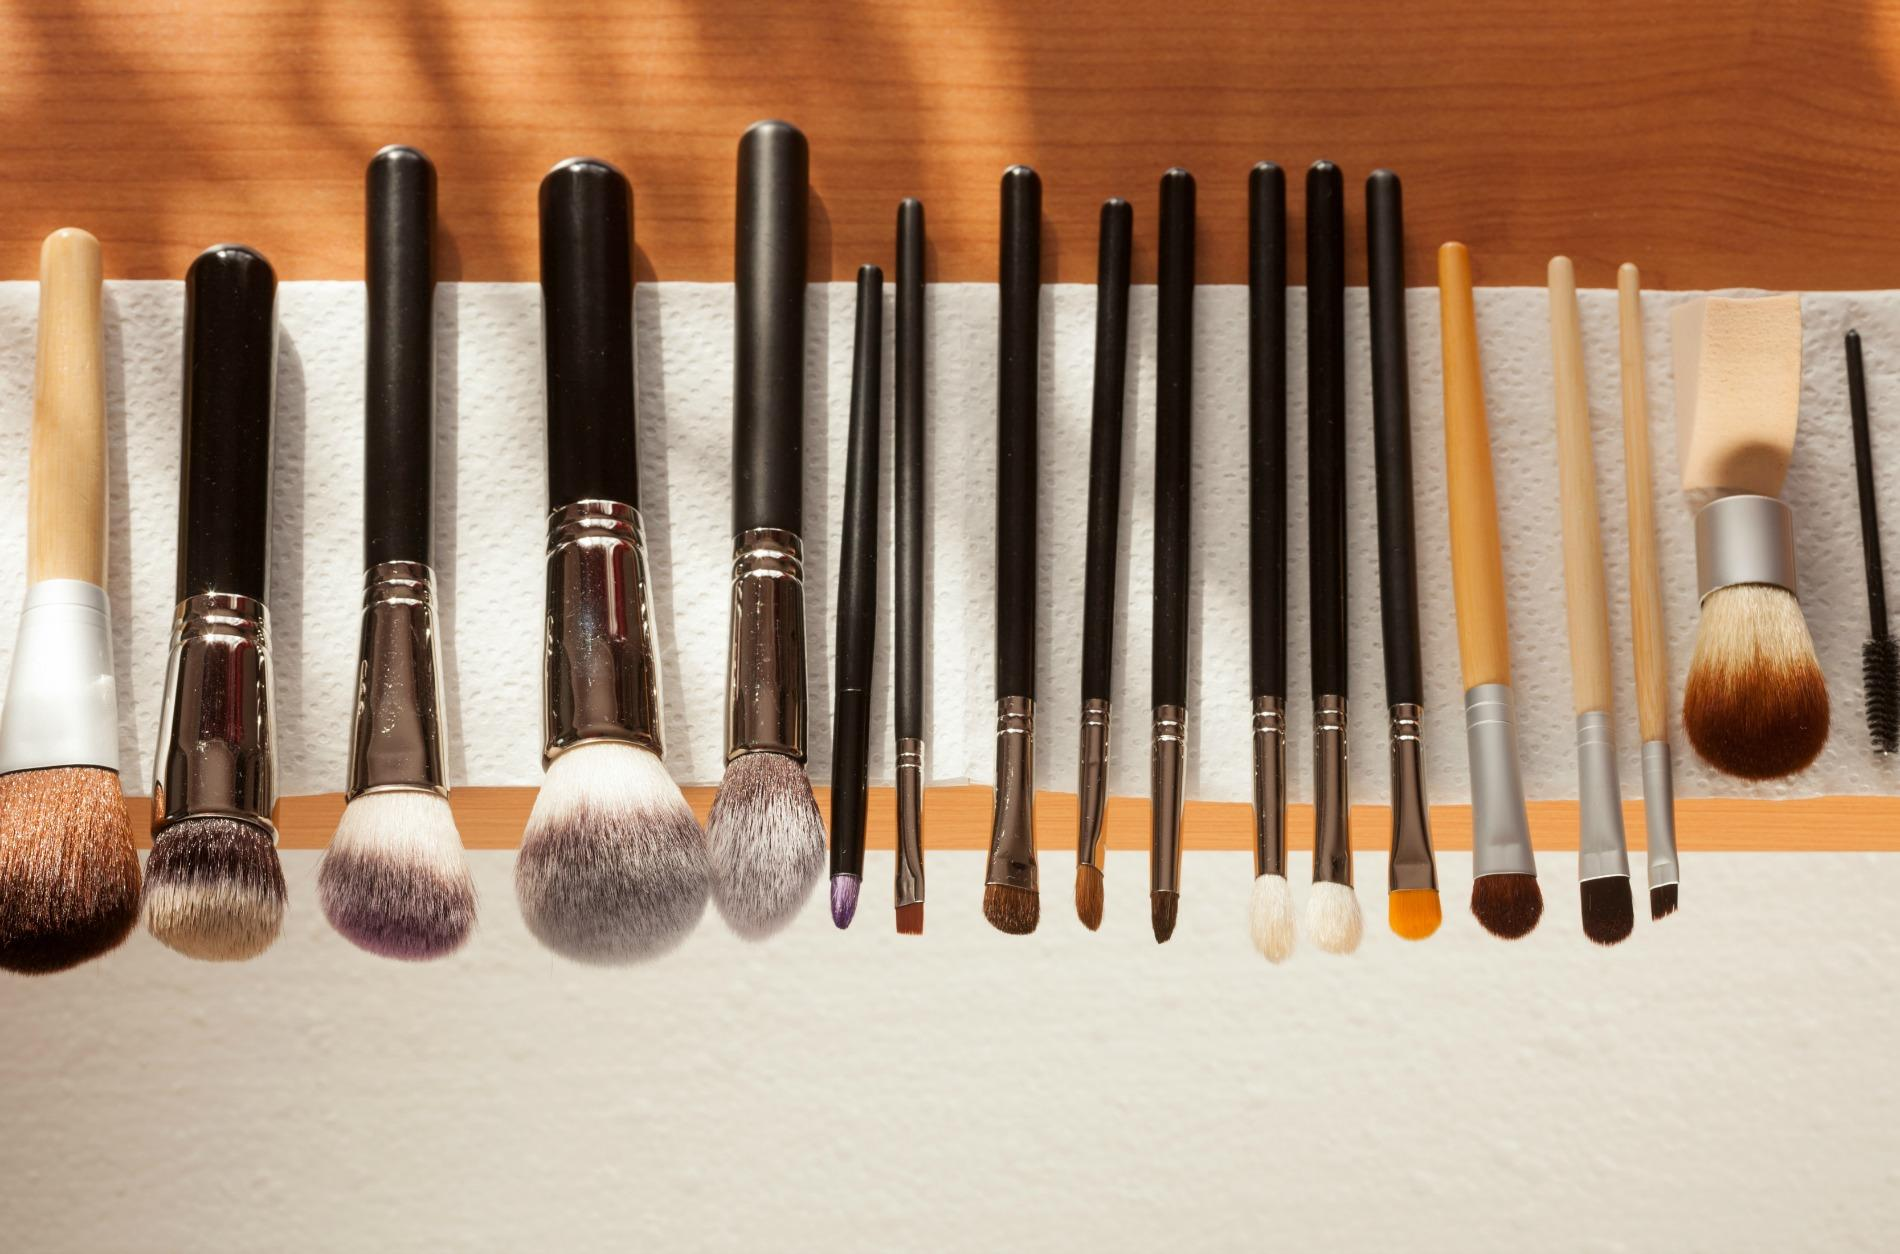 comment nettoyer ses pinceaux de maquillage madame figaro. Black Bedroom Furniture Sets. Home Design Ideas